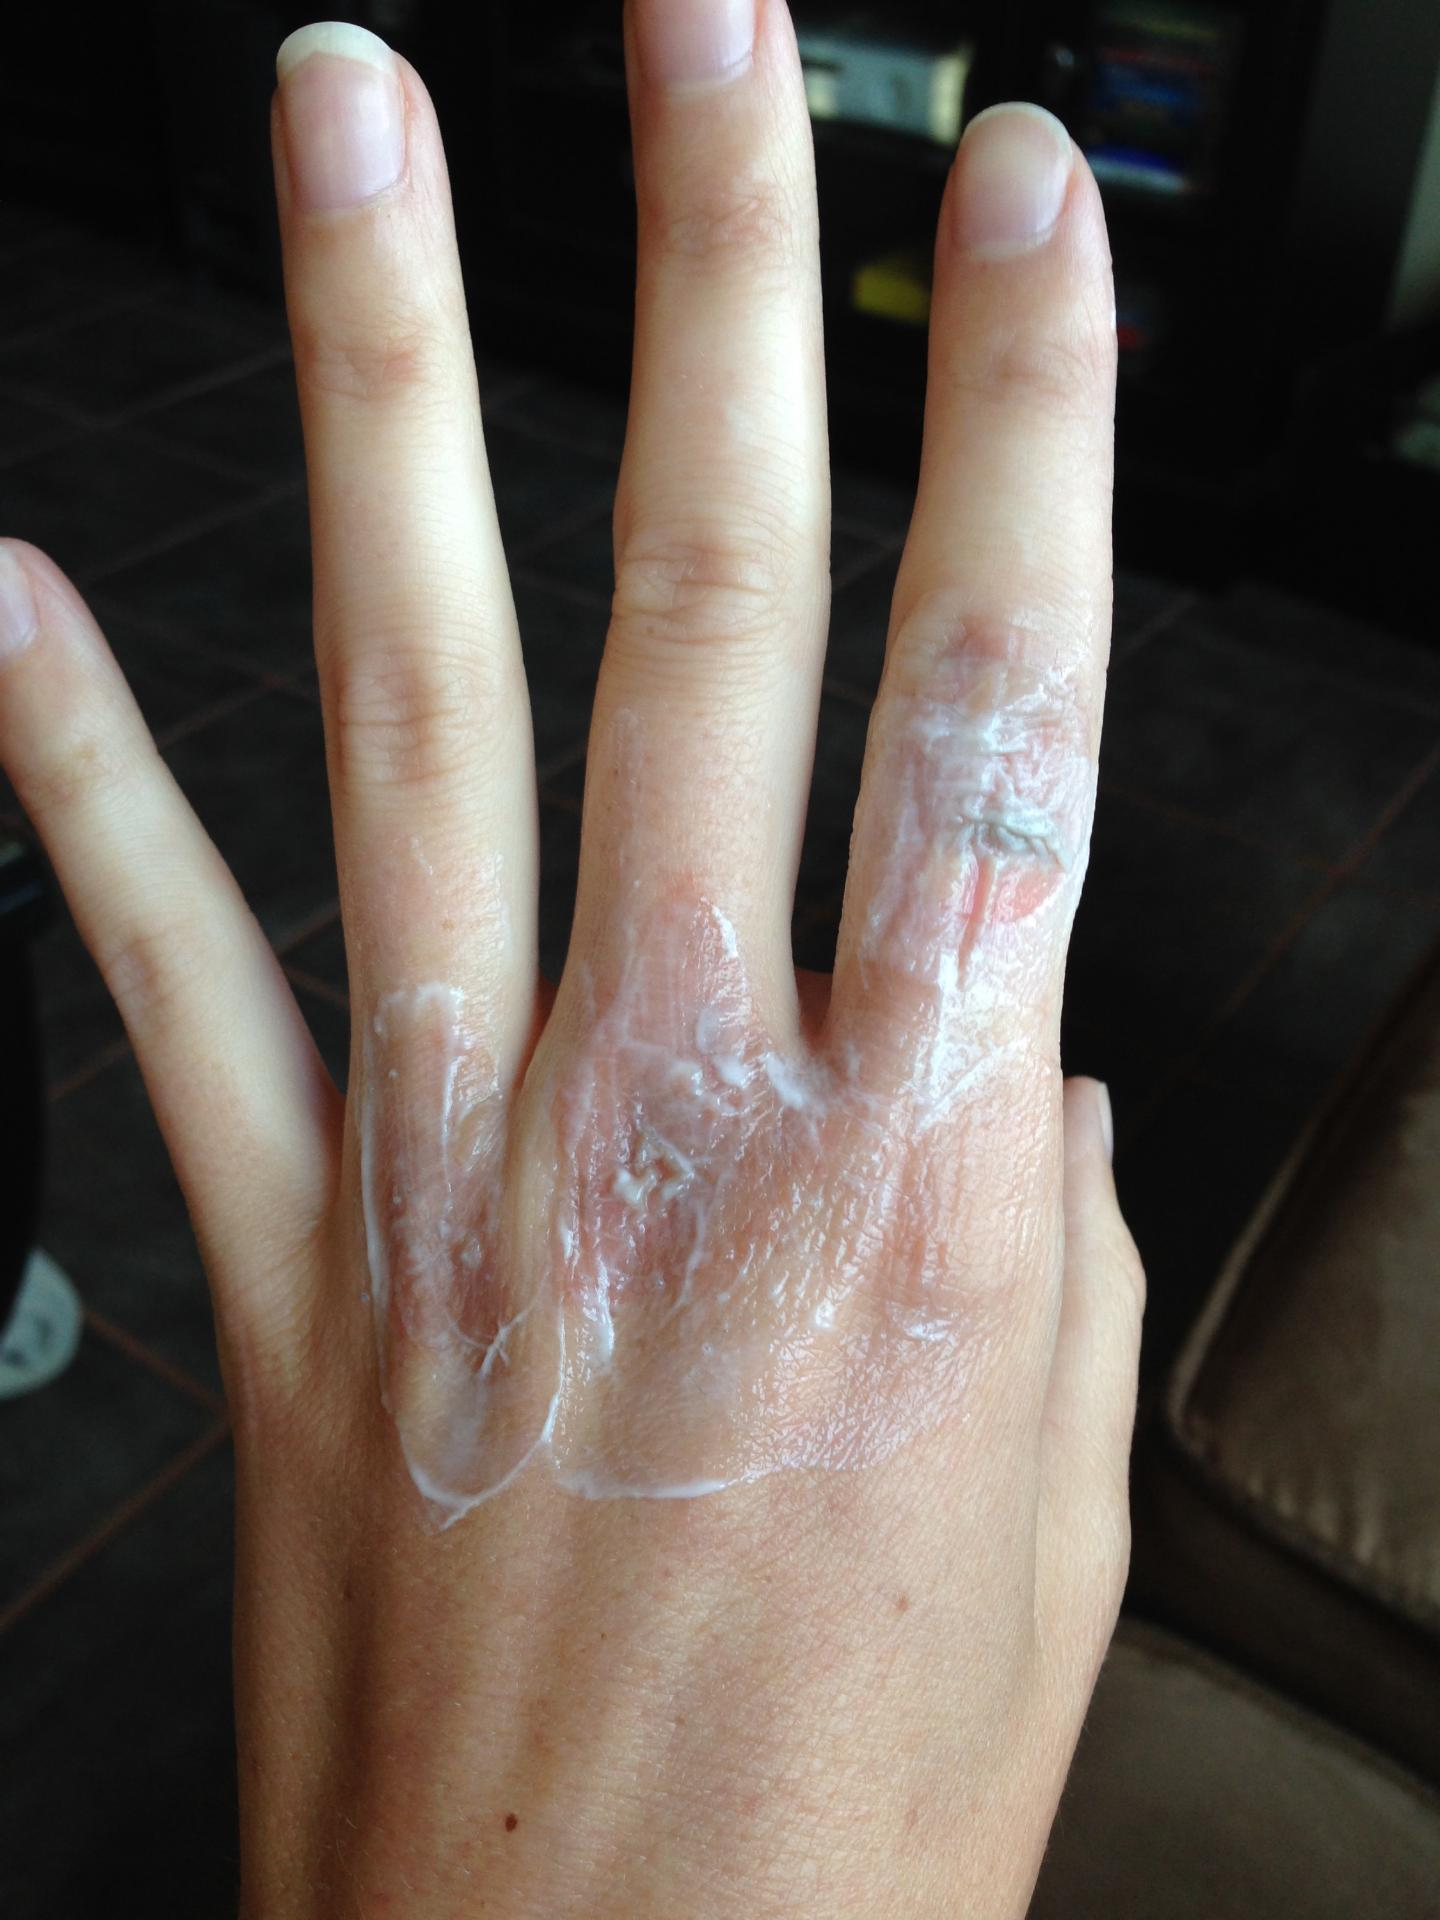 burned-hand-with-msm-cream.jpg